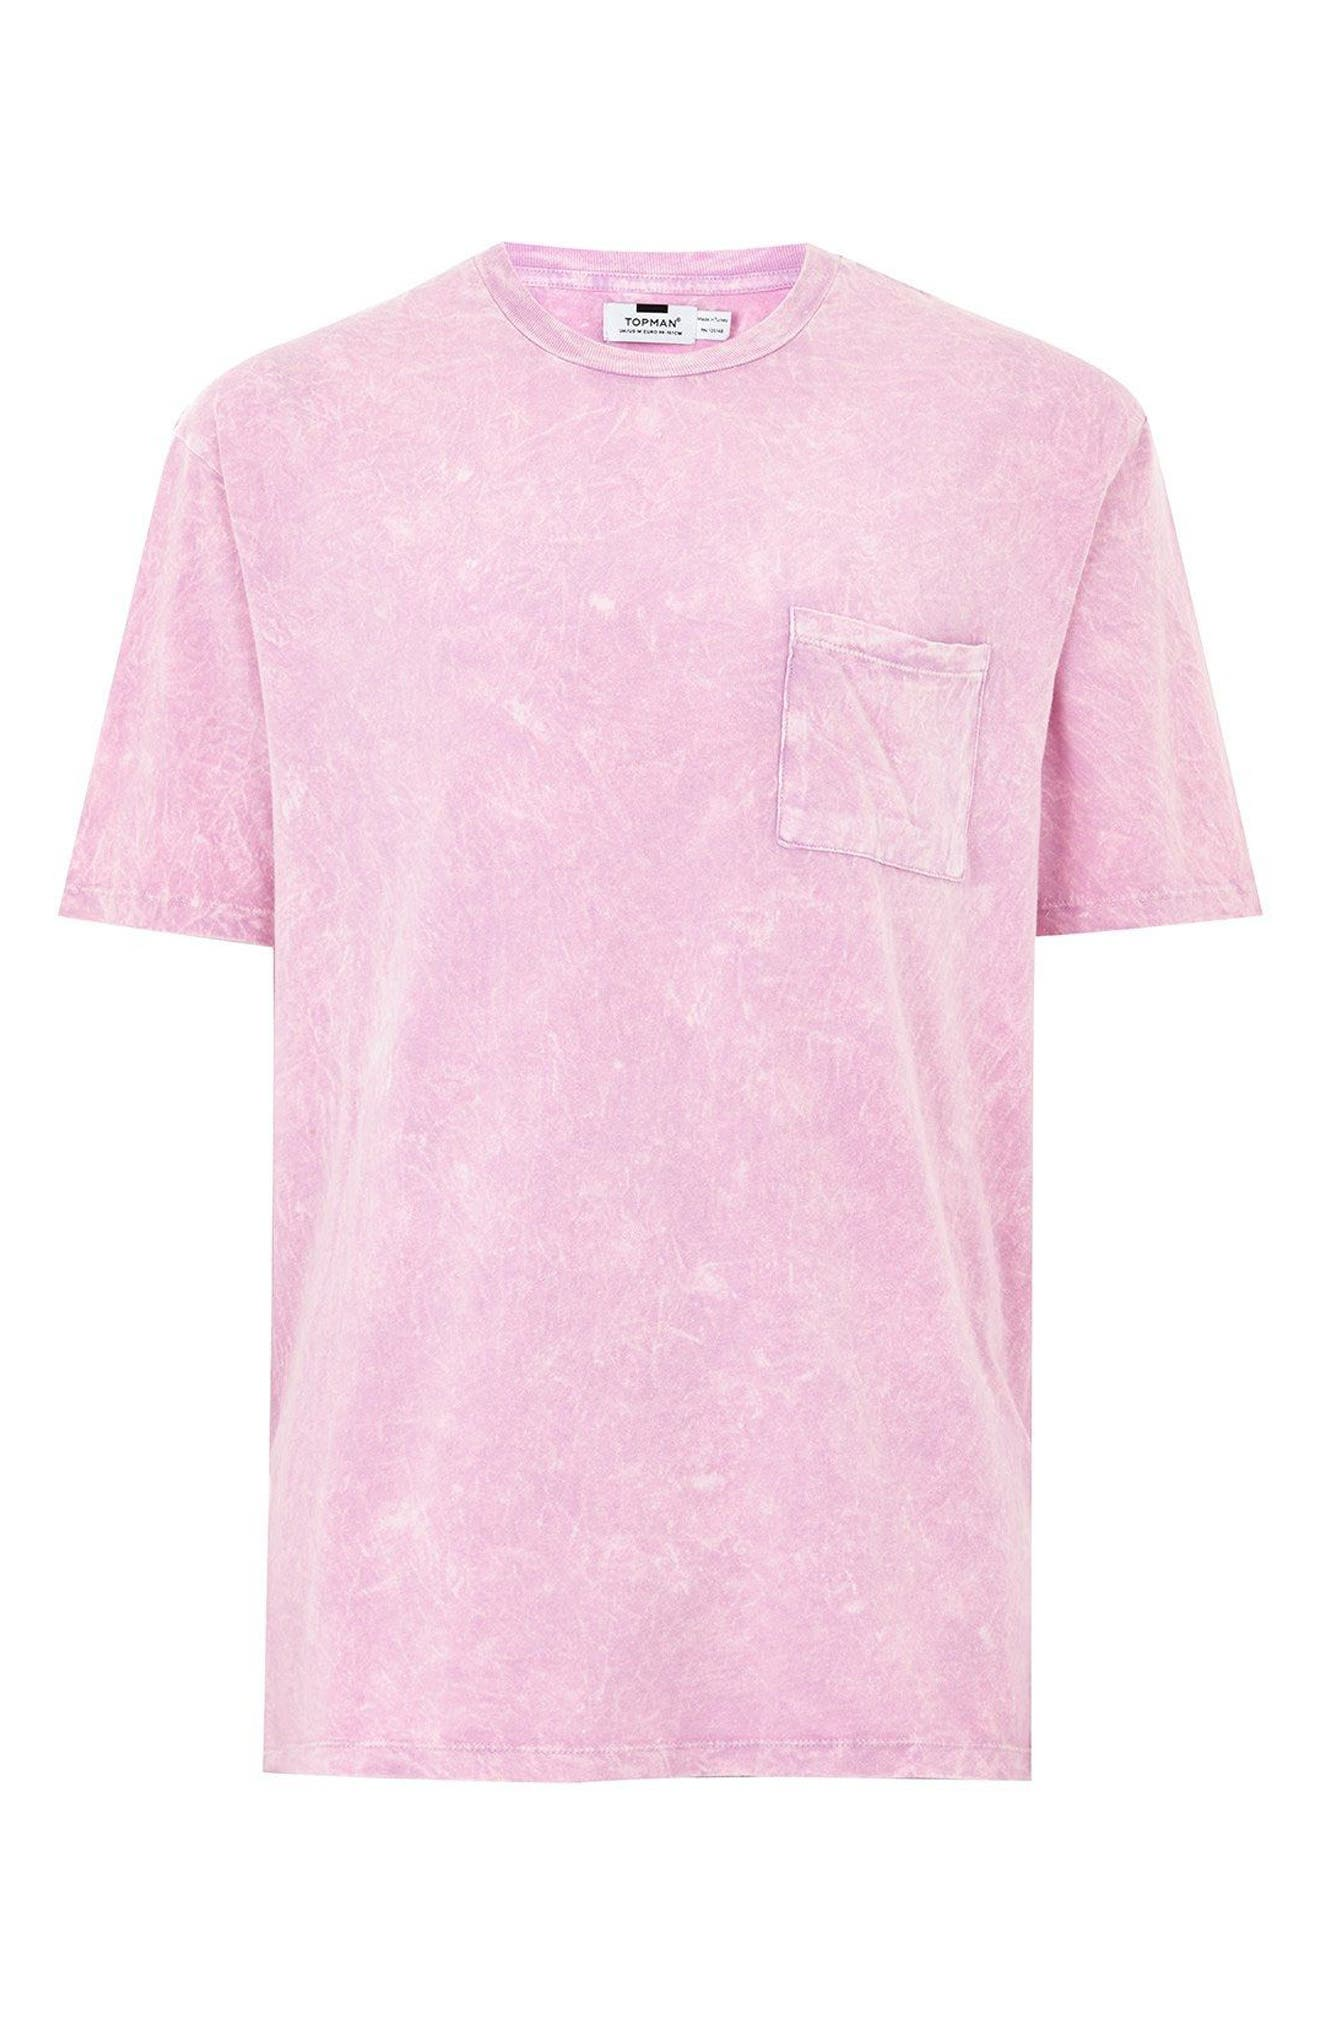 Acid Wash Pocket T-Shirt,                             Alternate thumbnail 4, color,                             650